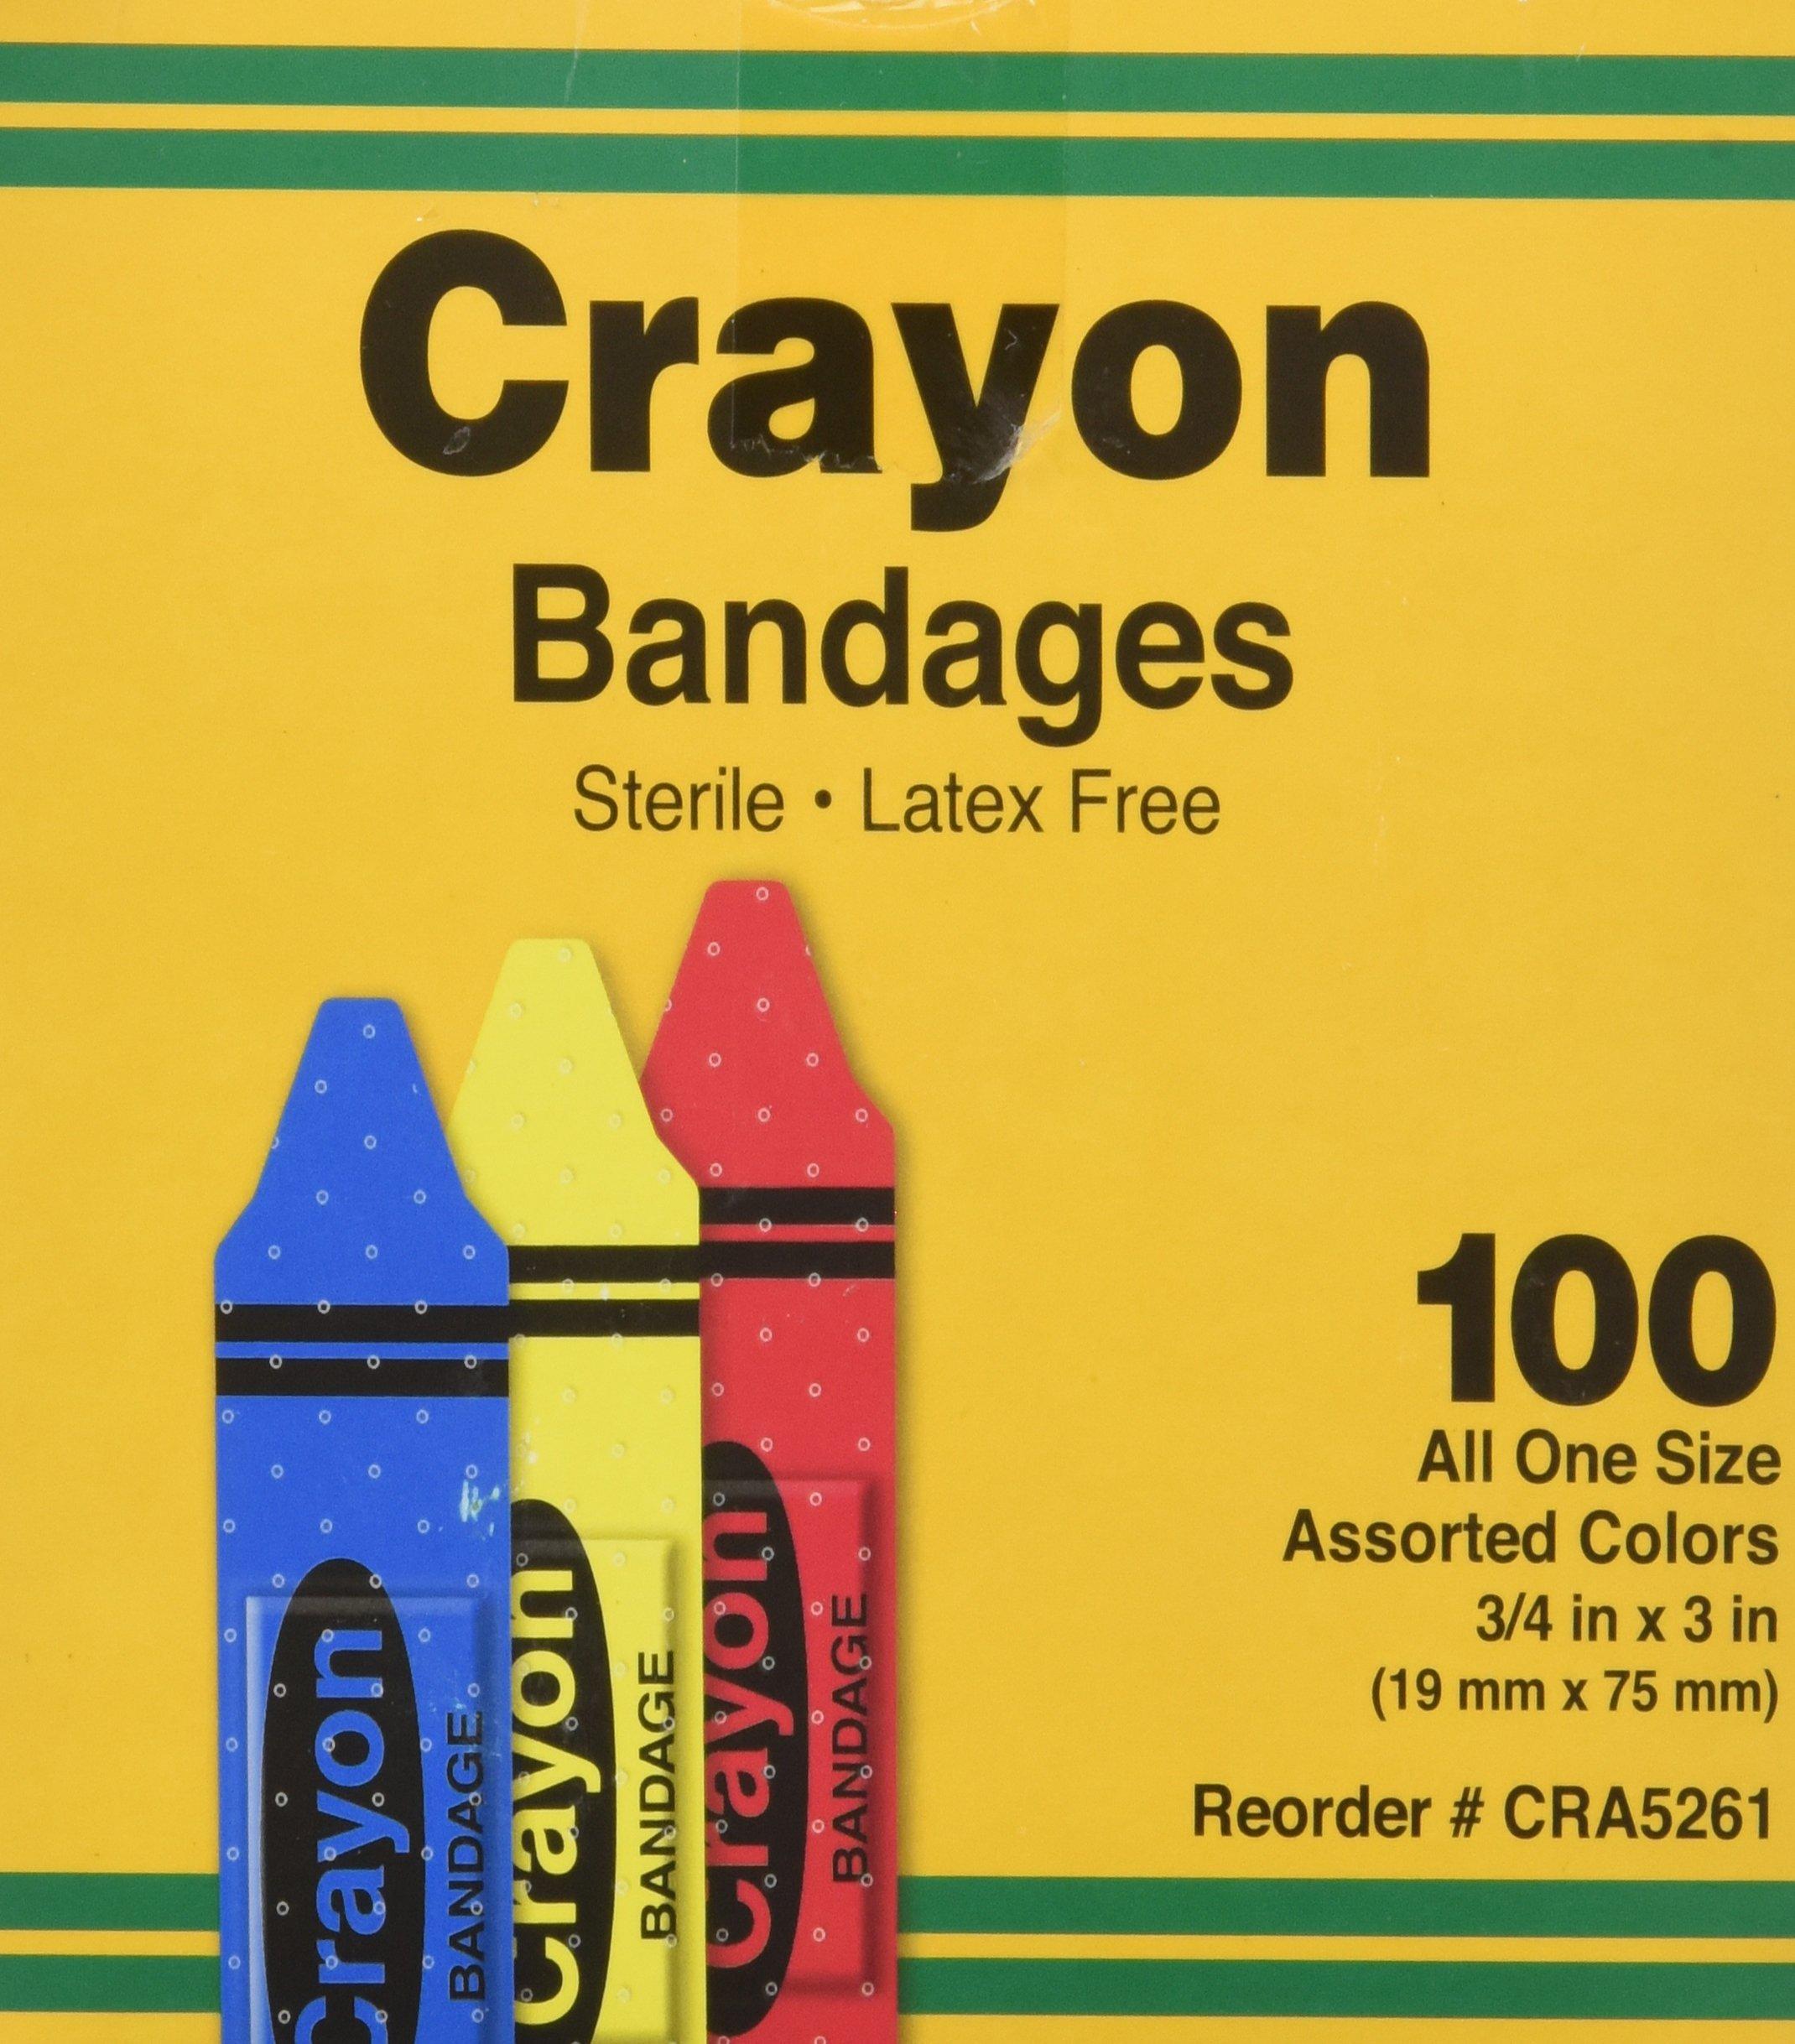 ASO Corporation Bandages, Crayon Strips, Adhesive, 100/BX (AGPCRA5261) Category: Bandages and Dressings